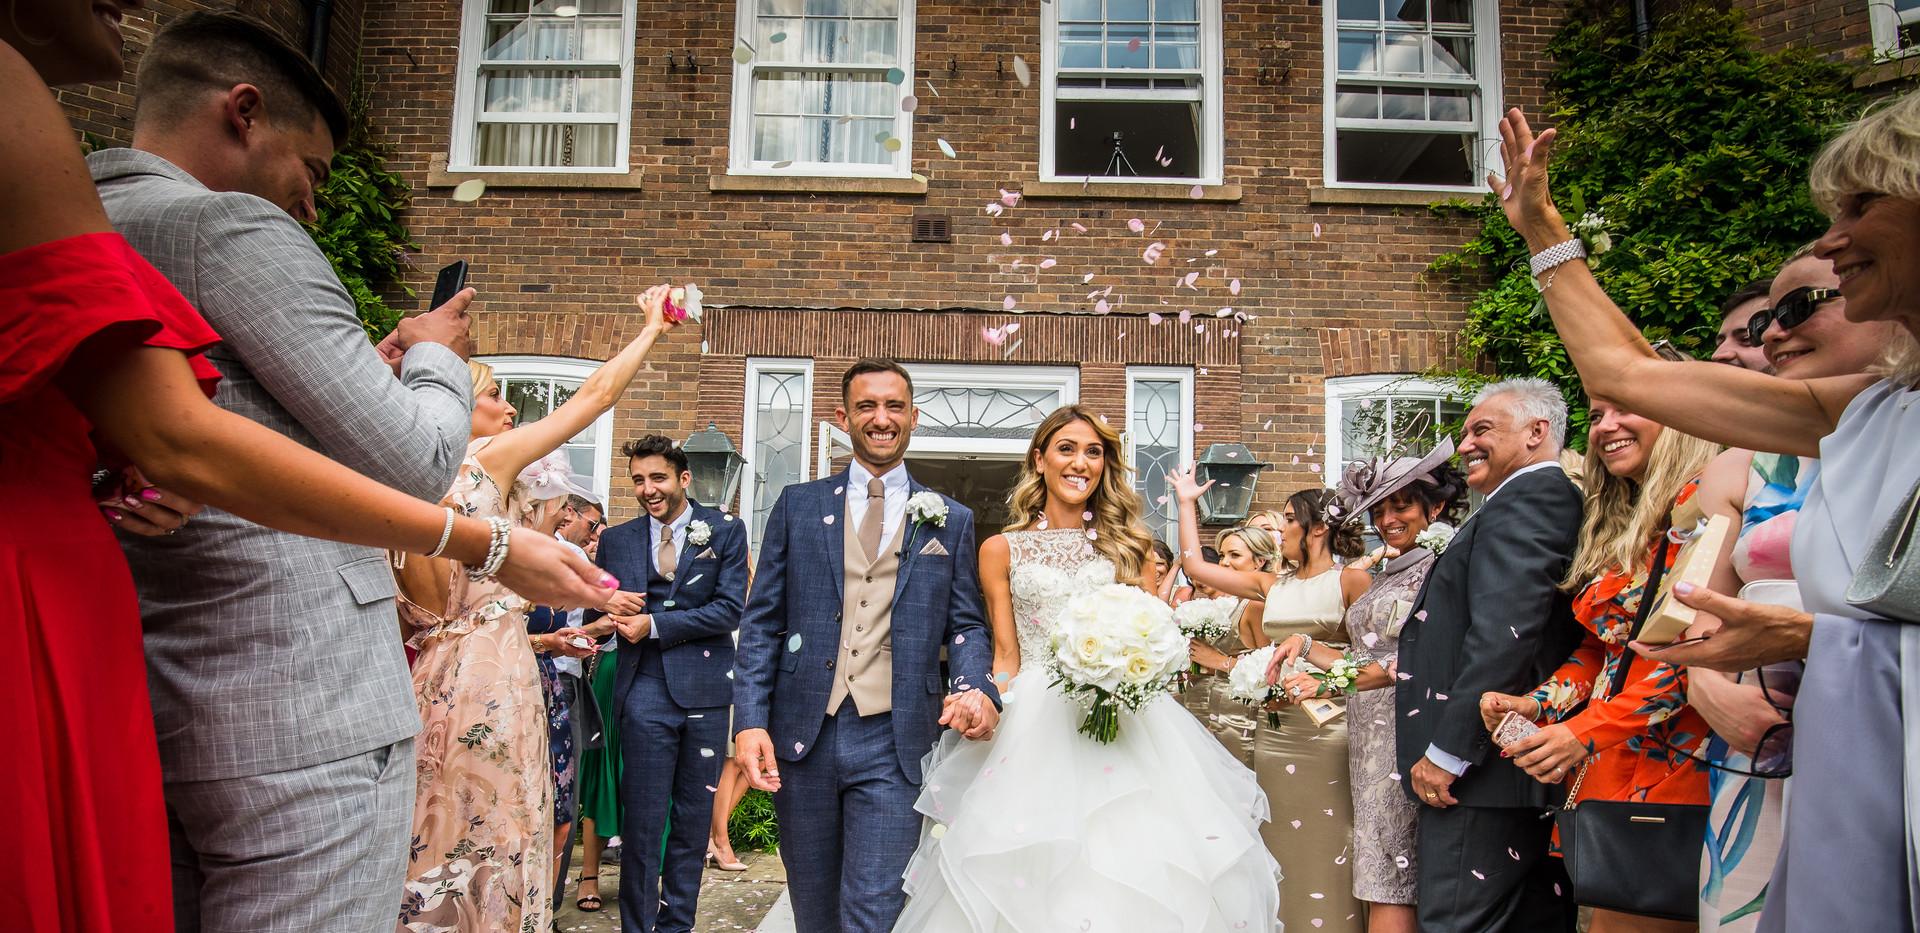 Delamere Manor Wedding Photography___32.